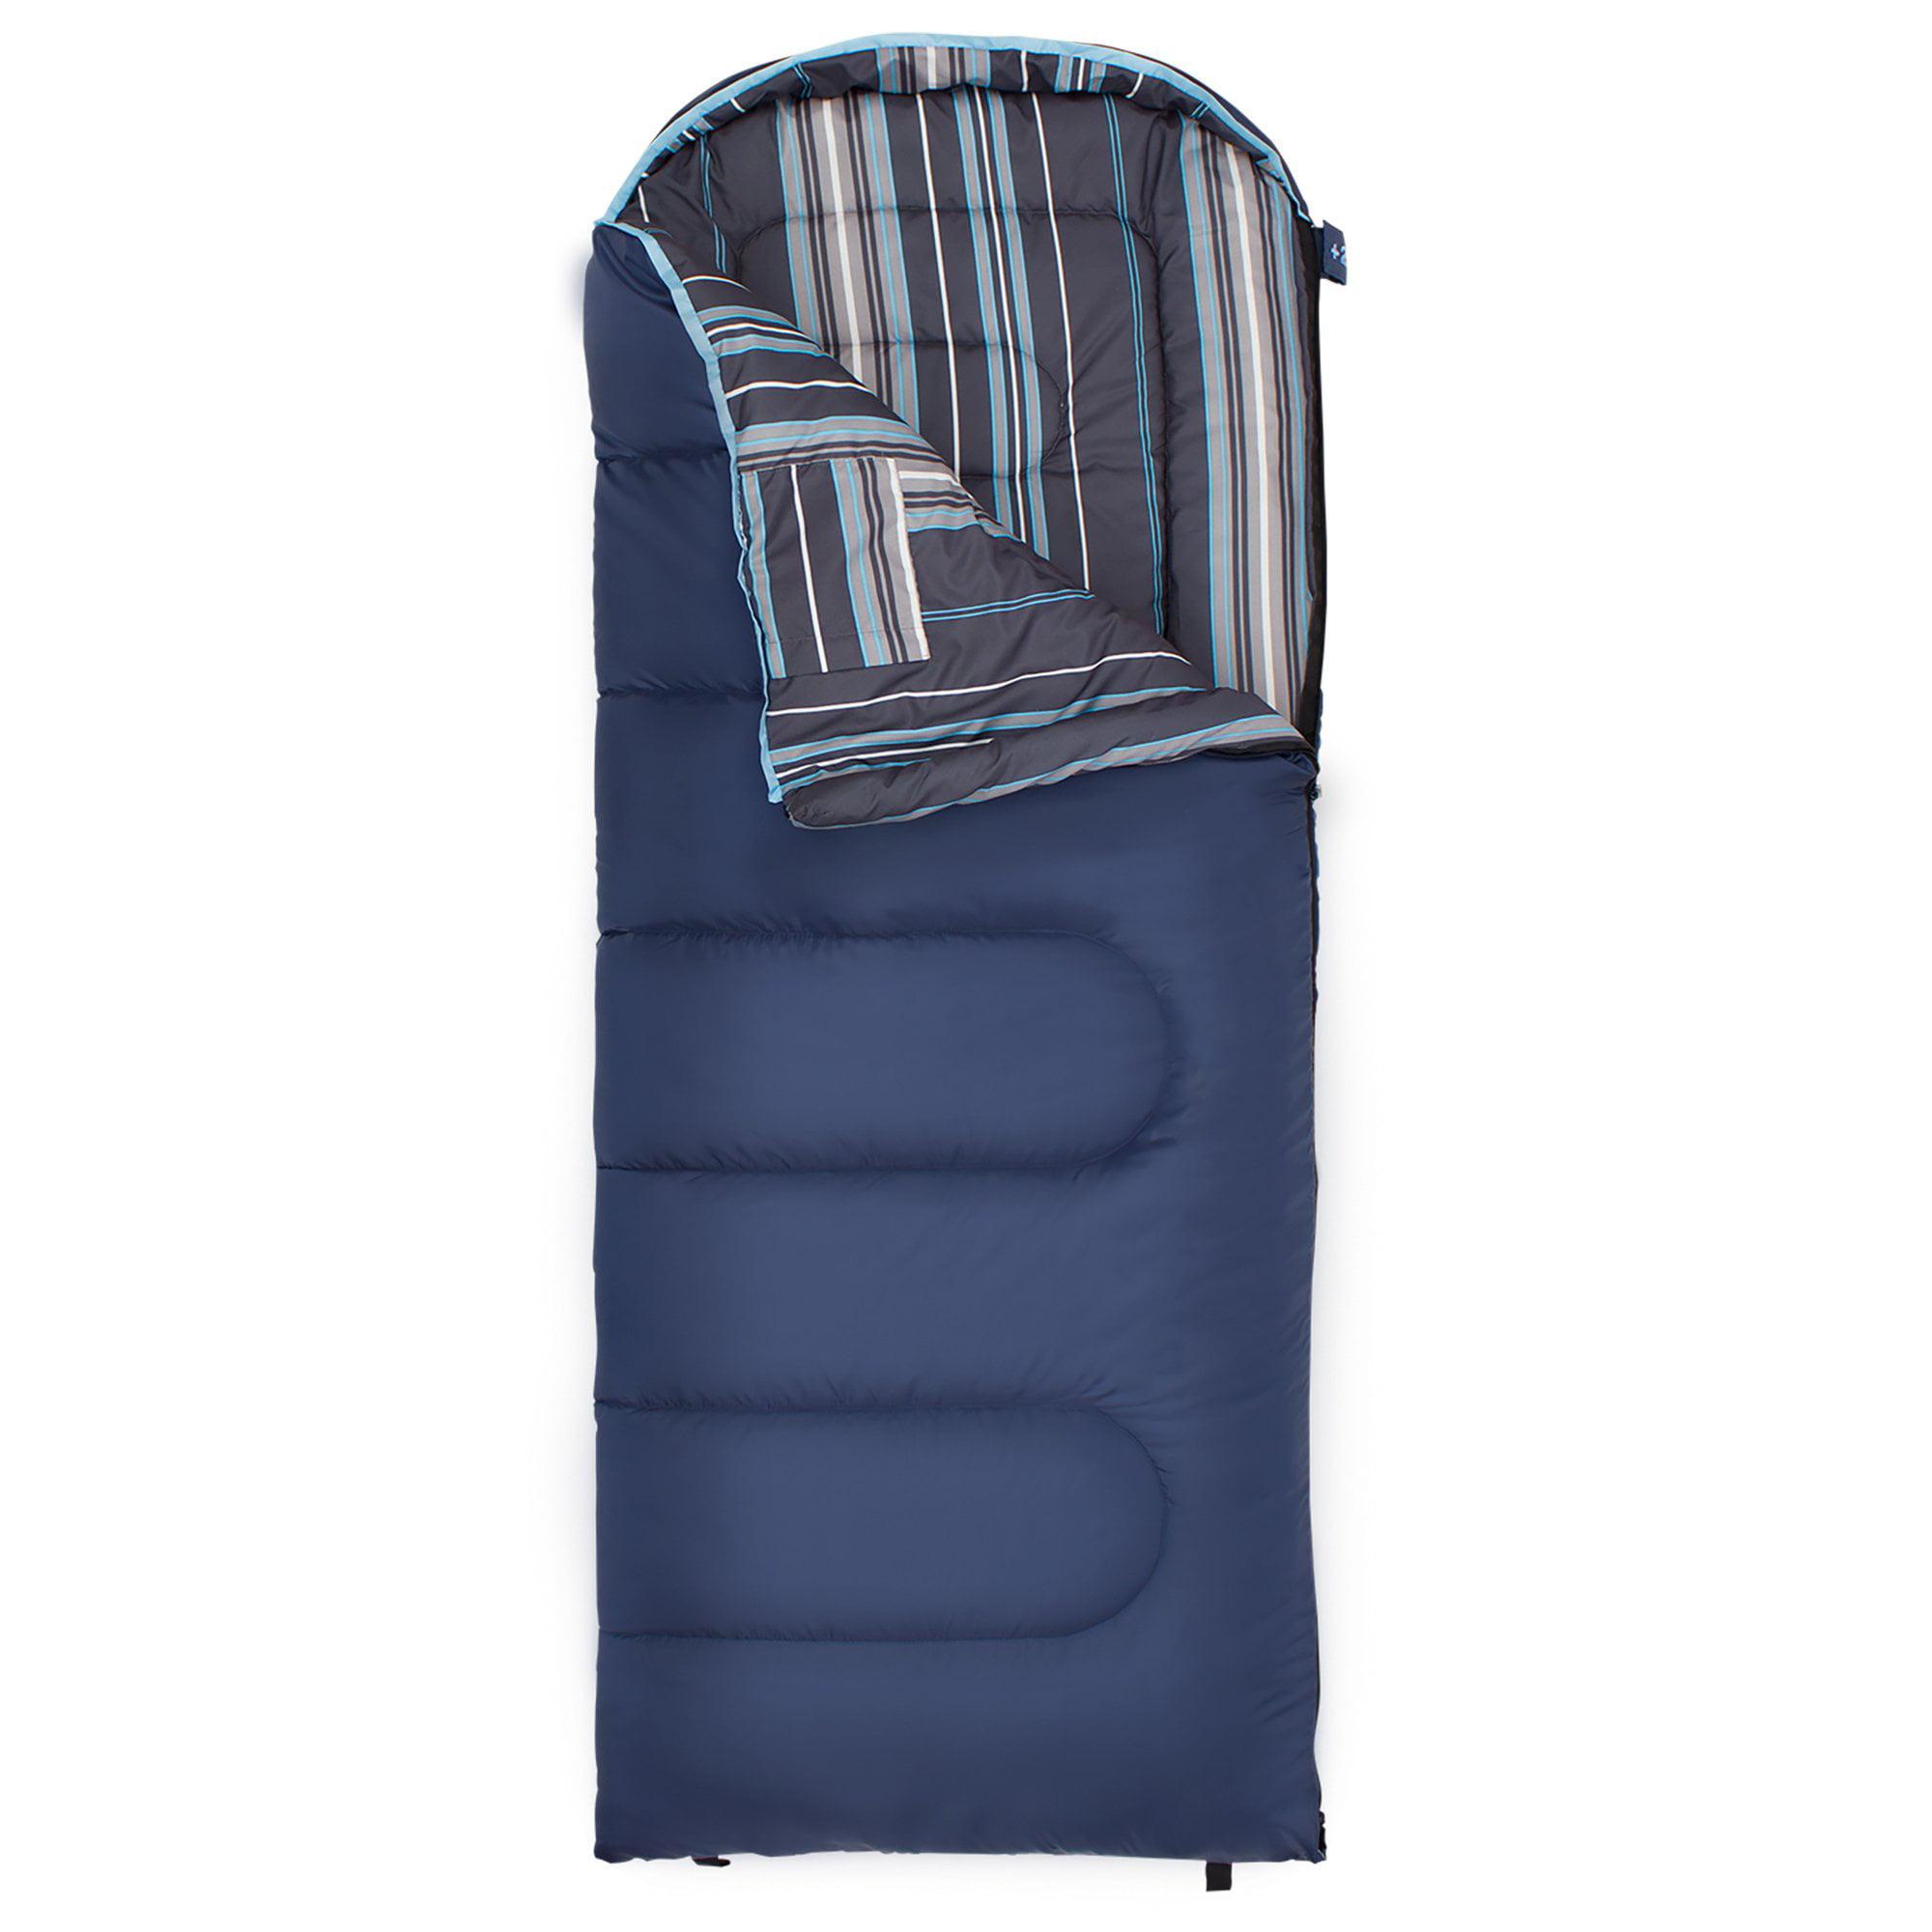 Celsius? Jr -7C/+20F Sleeping Bag (Blue w/ stripe liner) left zip